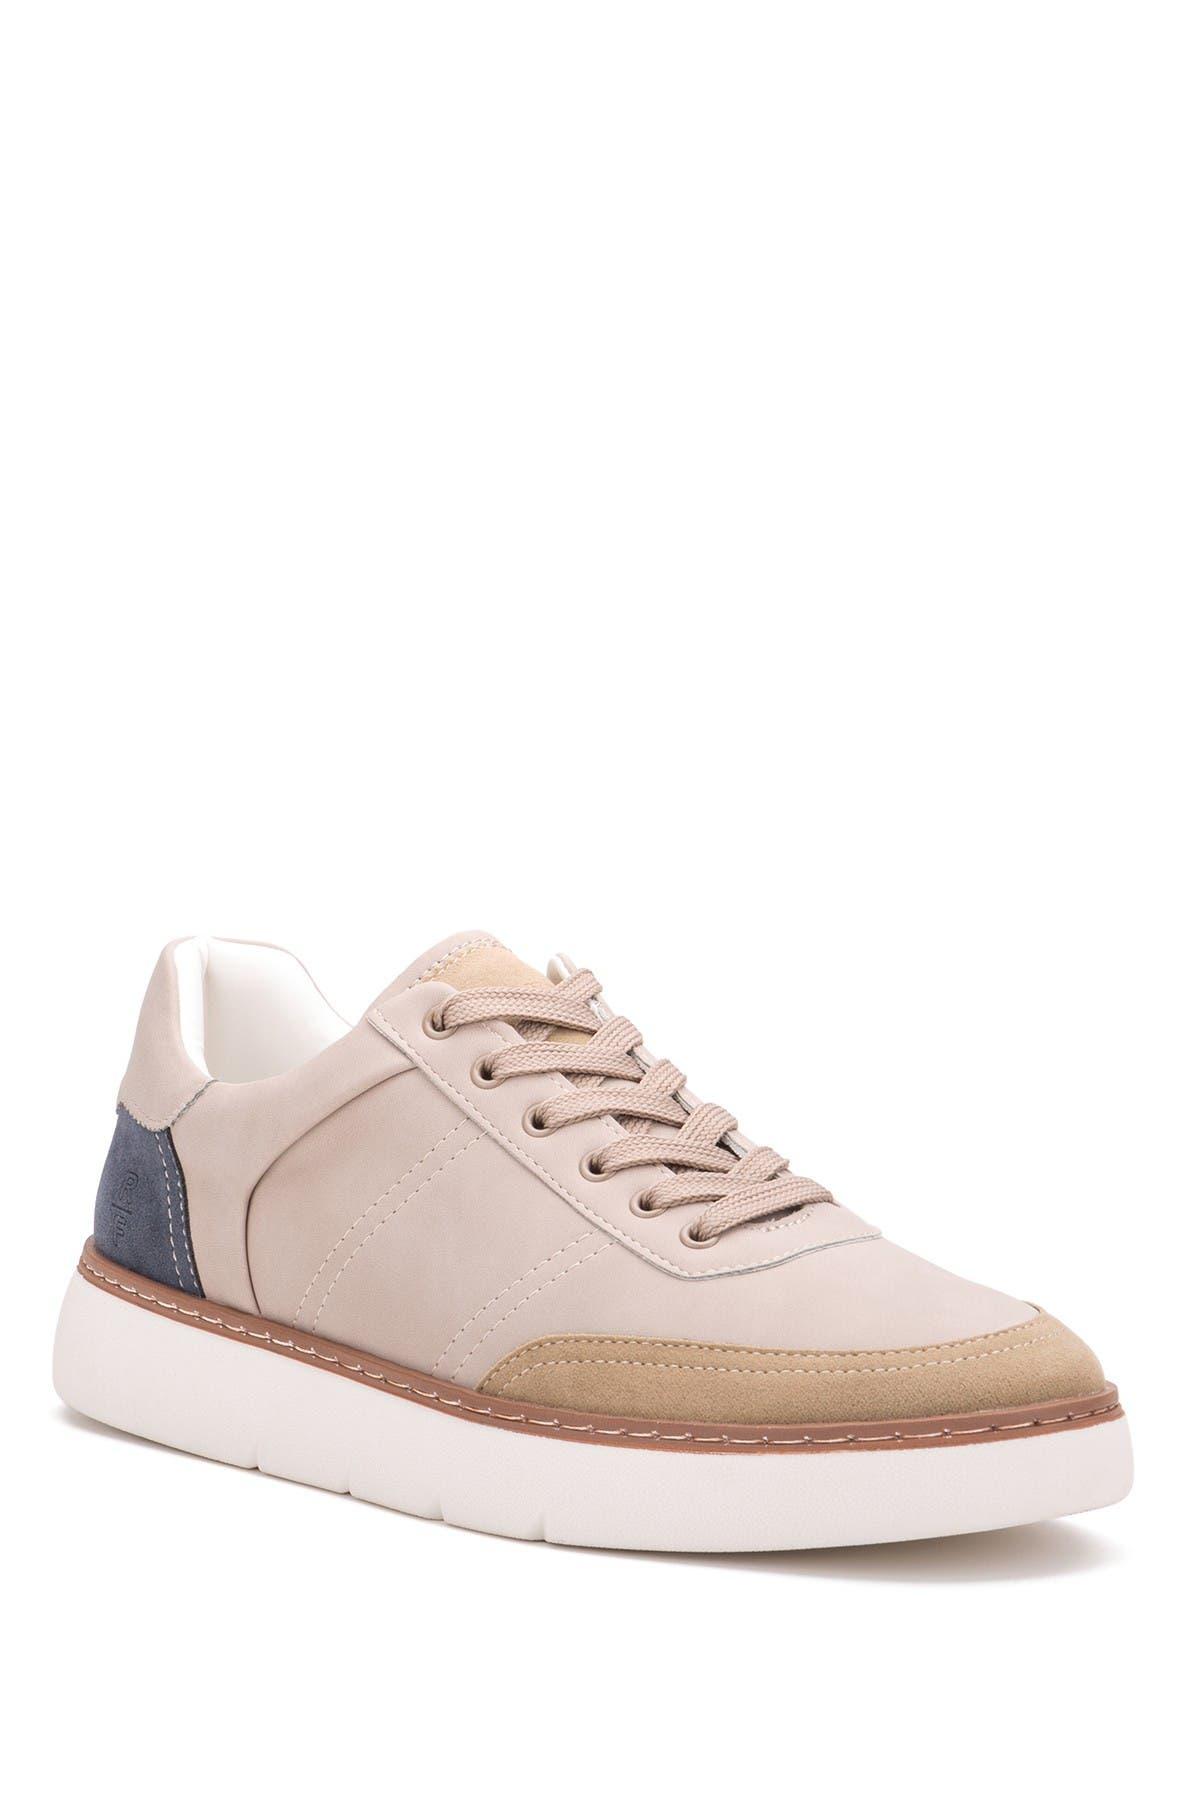 Image of Reserved Footwear Linden Cap Toe Sneaker